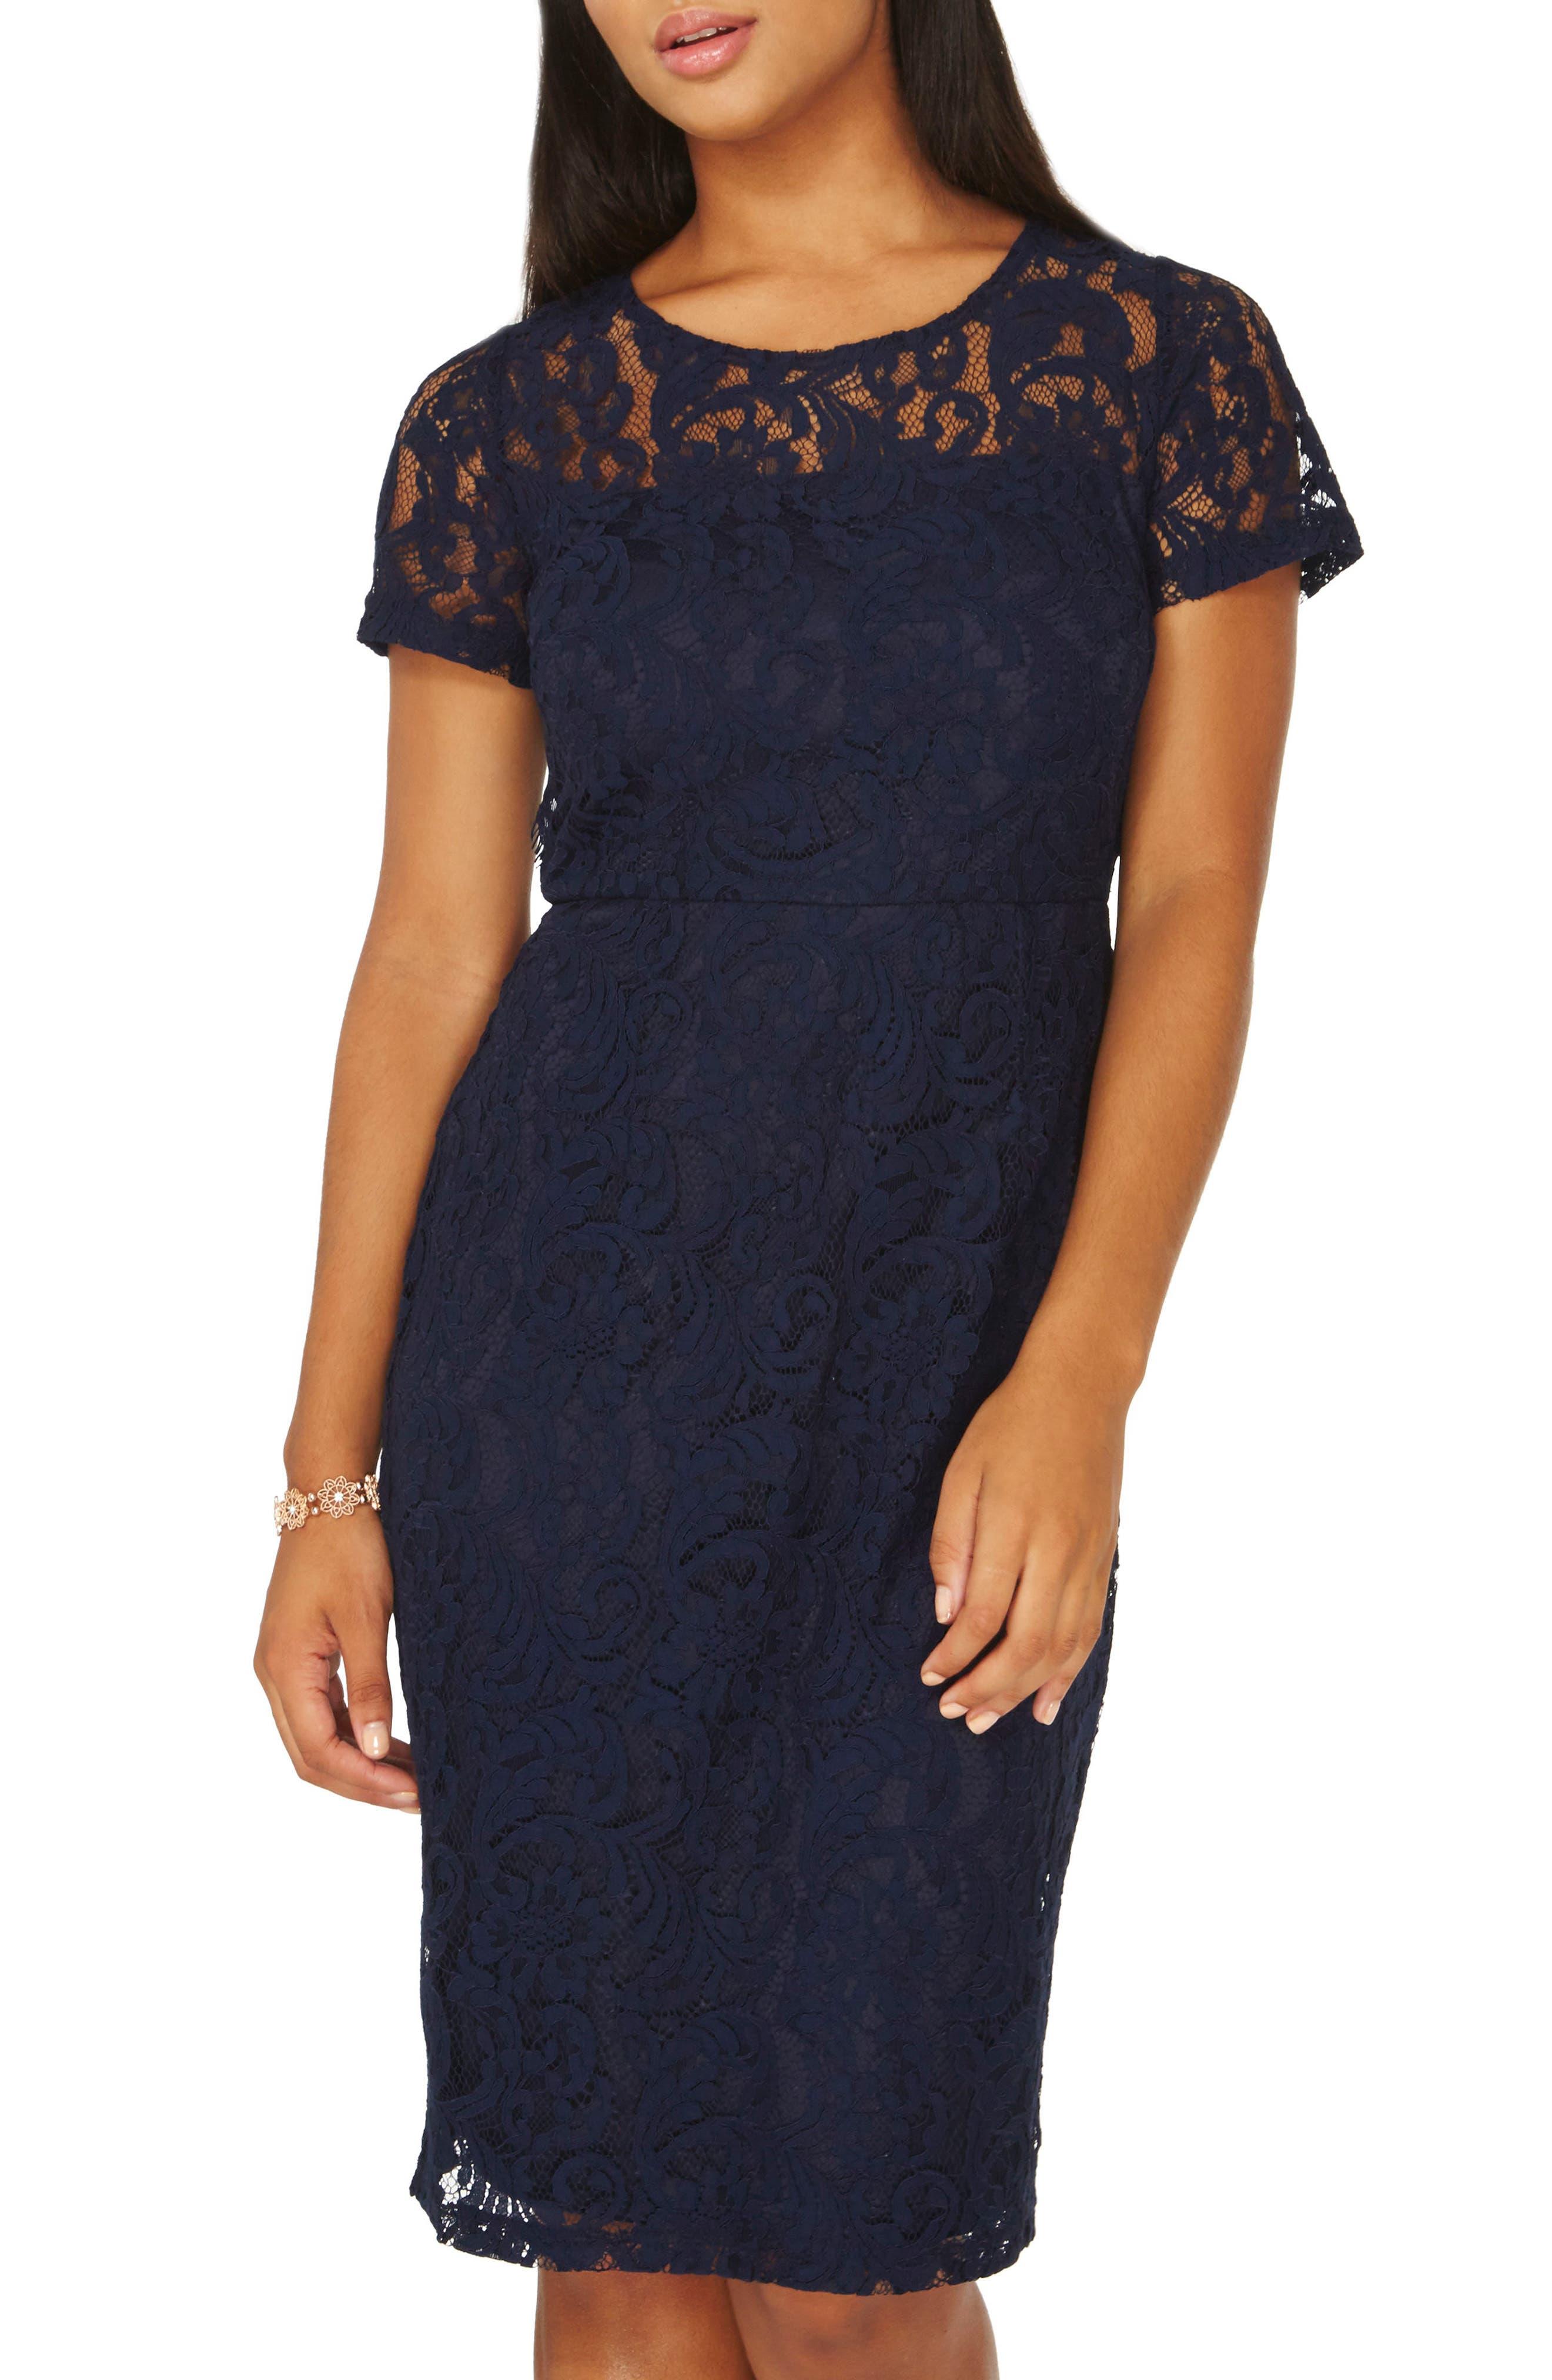 Lace Pencil Dress,                             Main thumbnail 1, color,                             Navy